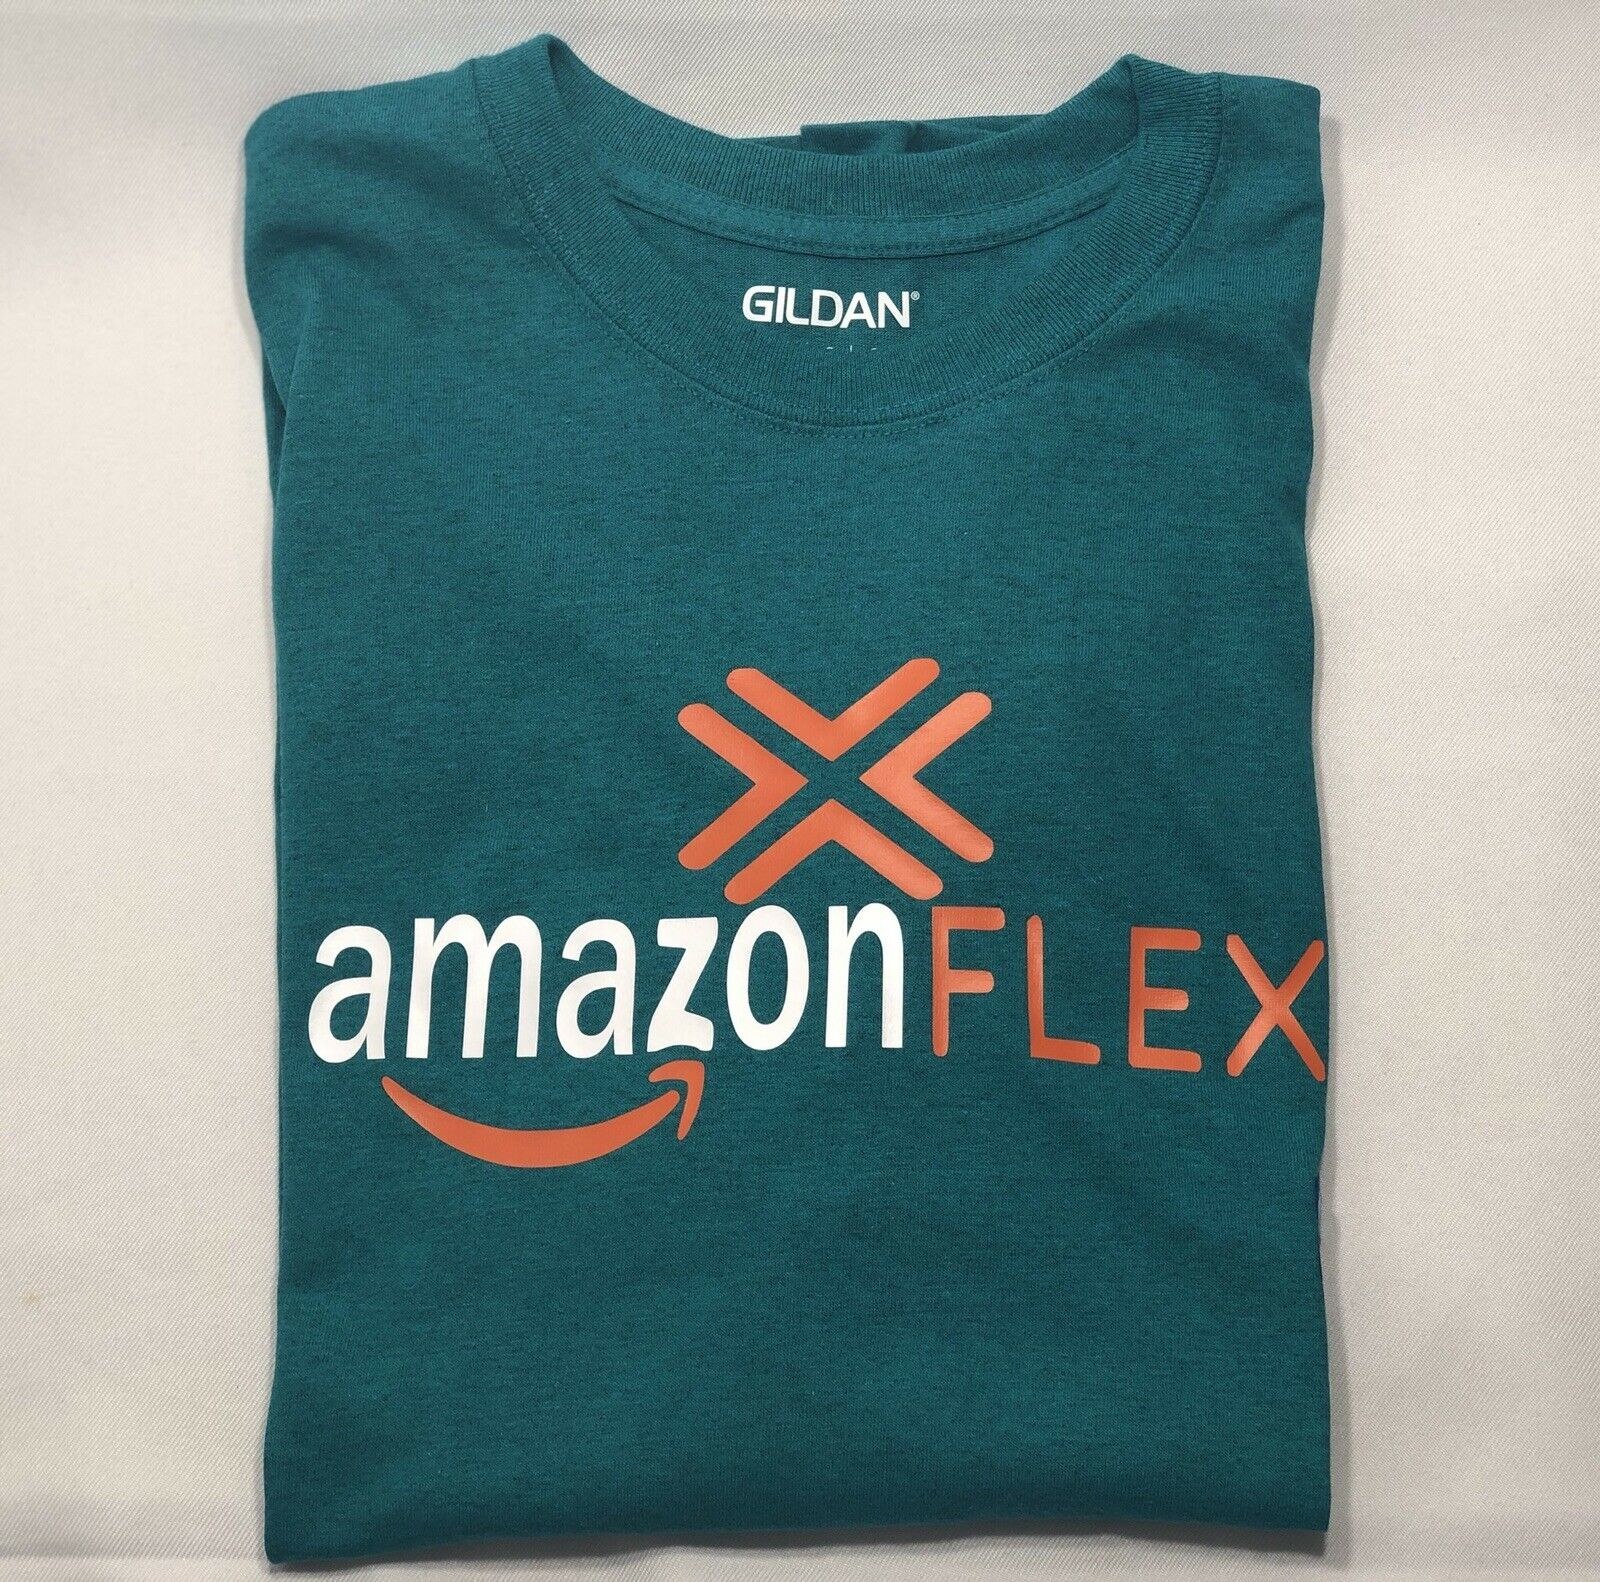 Gildan Adult T-Shirt Preshrunk Cotton Blend Decorated with A